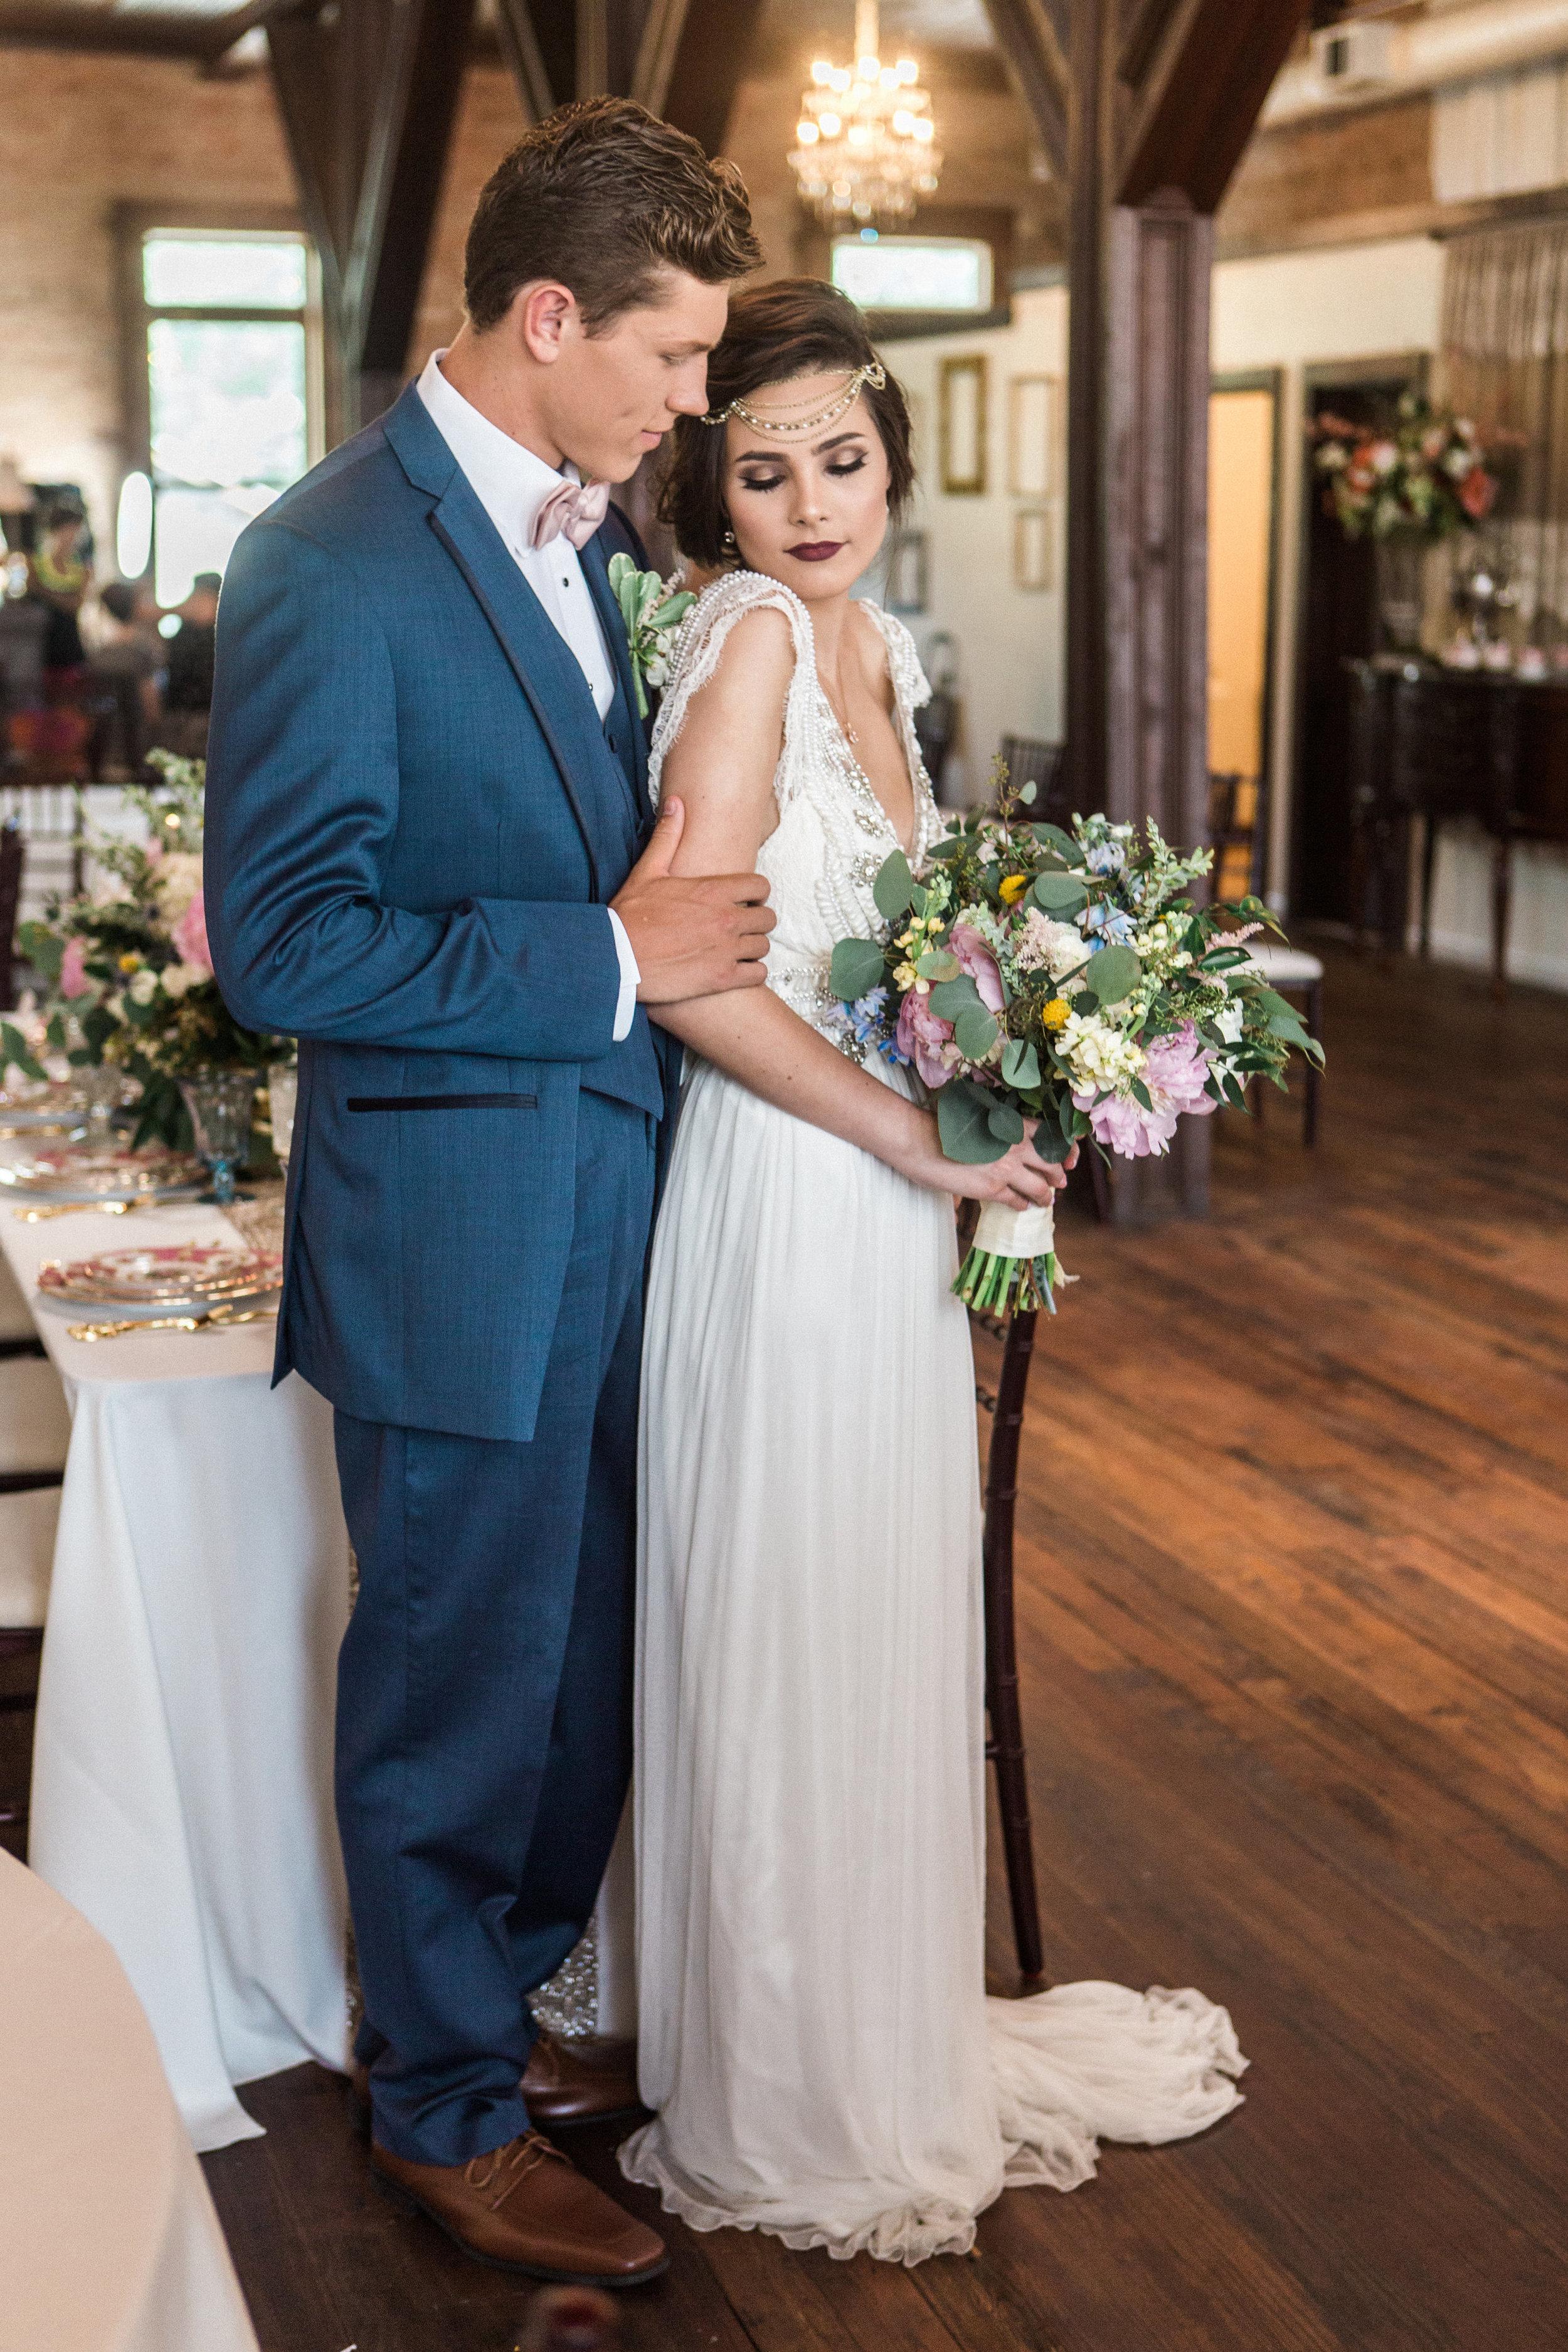 anna-campbell-coco-christa-o'brien-photography-the-corner-district-wedding-atlanta-wedding-savannah-bridal-boutique-ivory-and-beau-bridal-boutique-savannah-bridal-gowns-savannah-bridal-atlanta-bridal-boutique-borrowed-and-blue-5.jpg